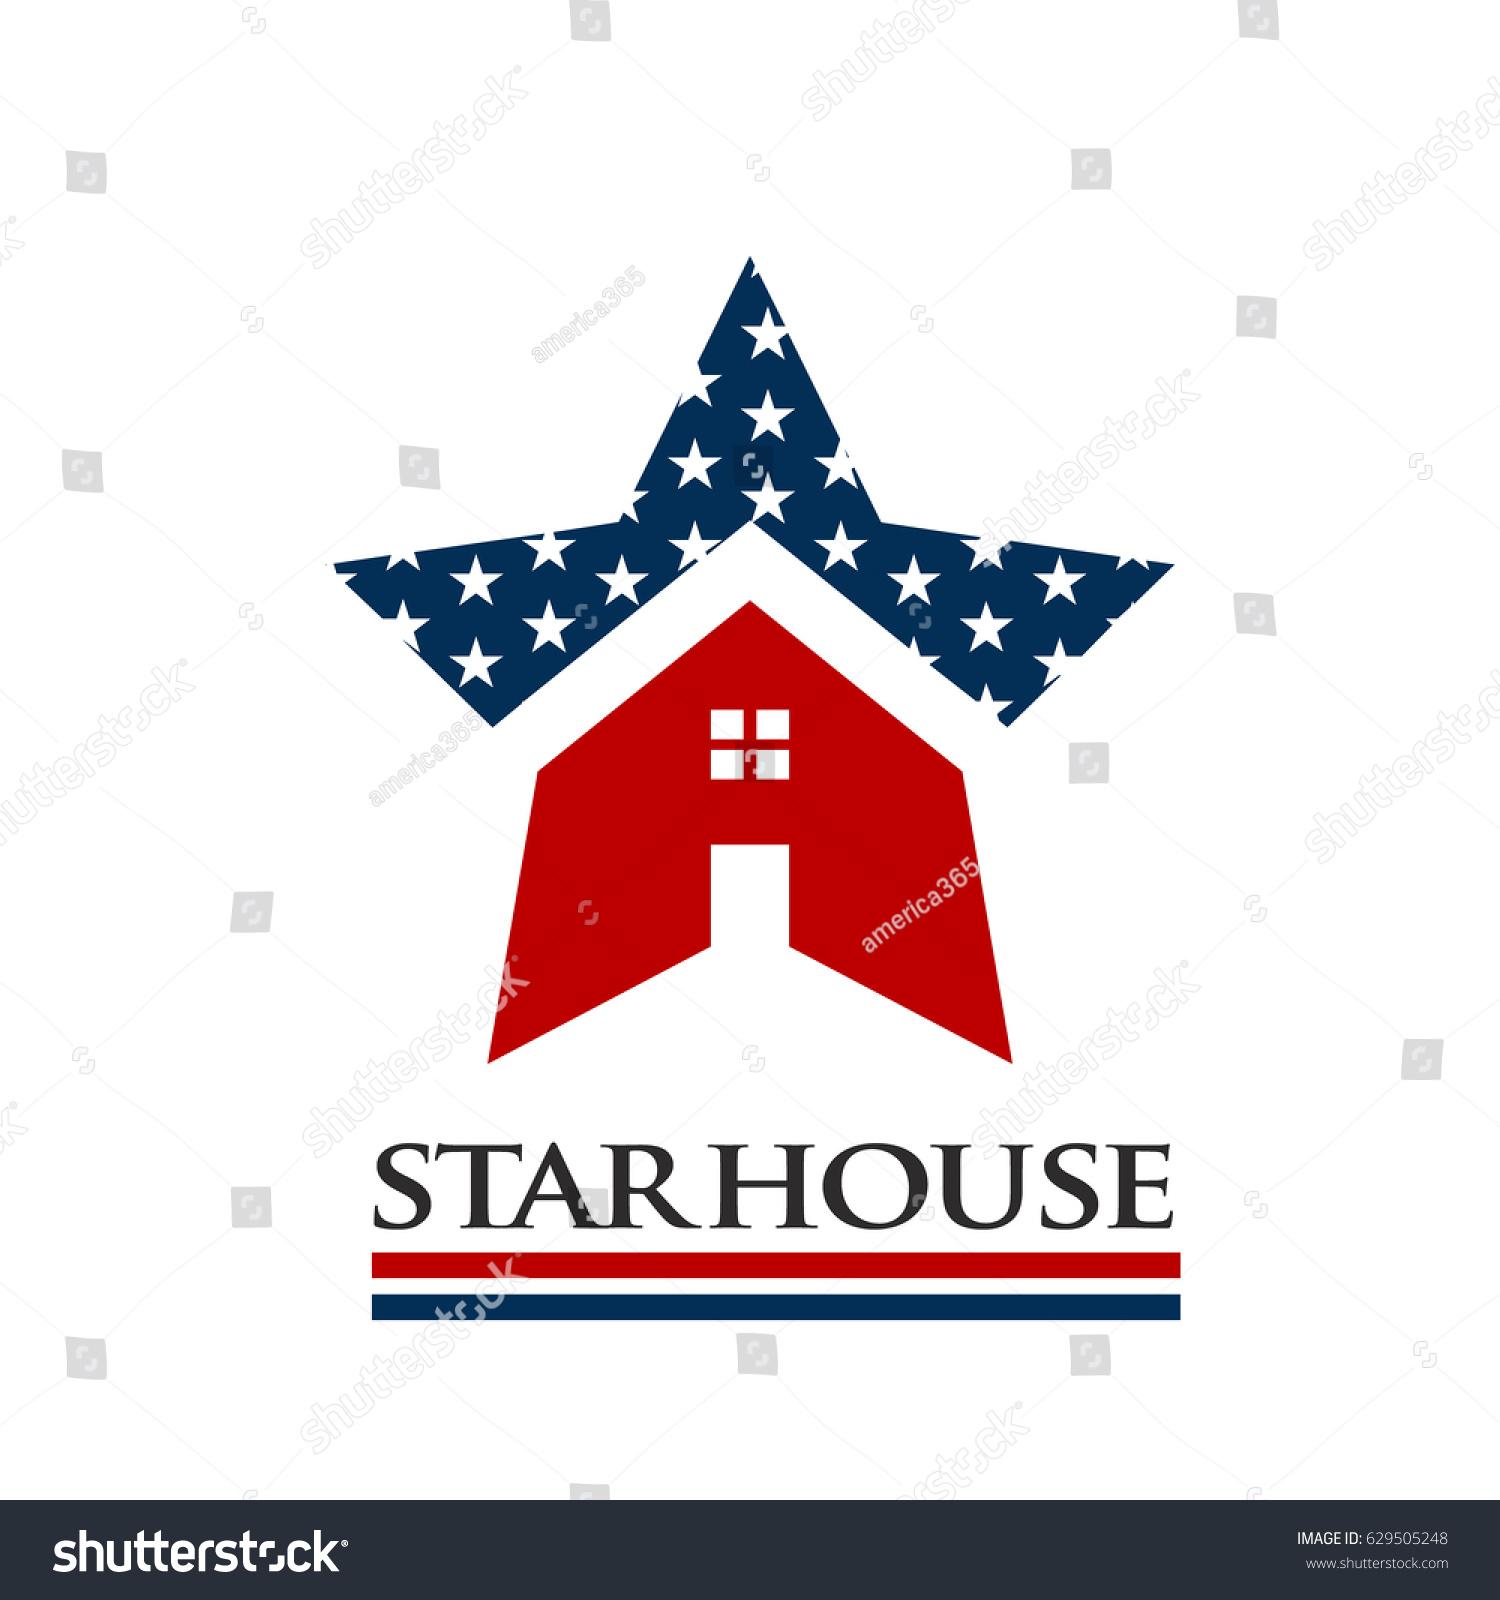 American star house award logo illustration stock vector for American house music